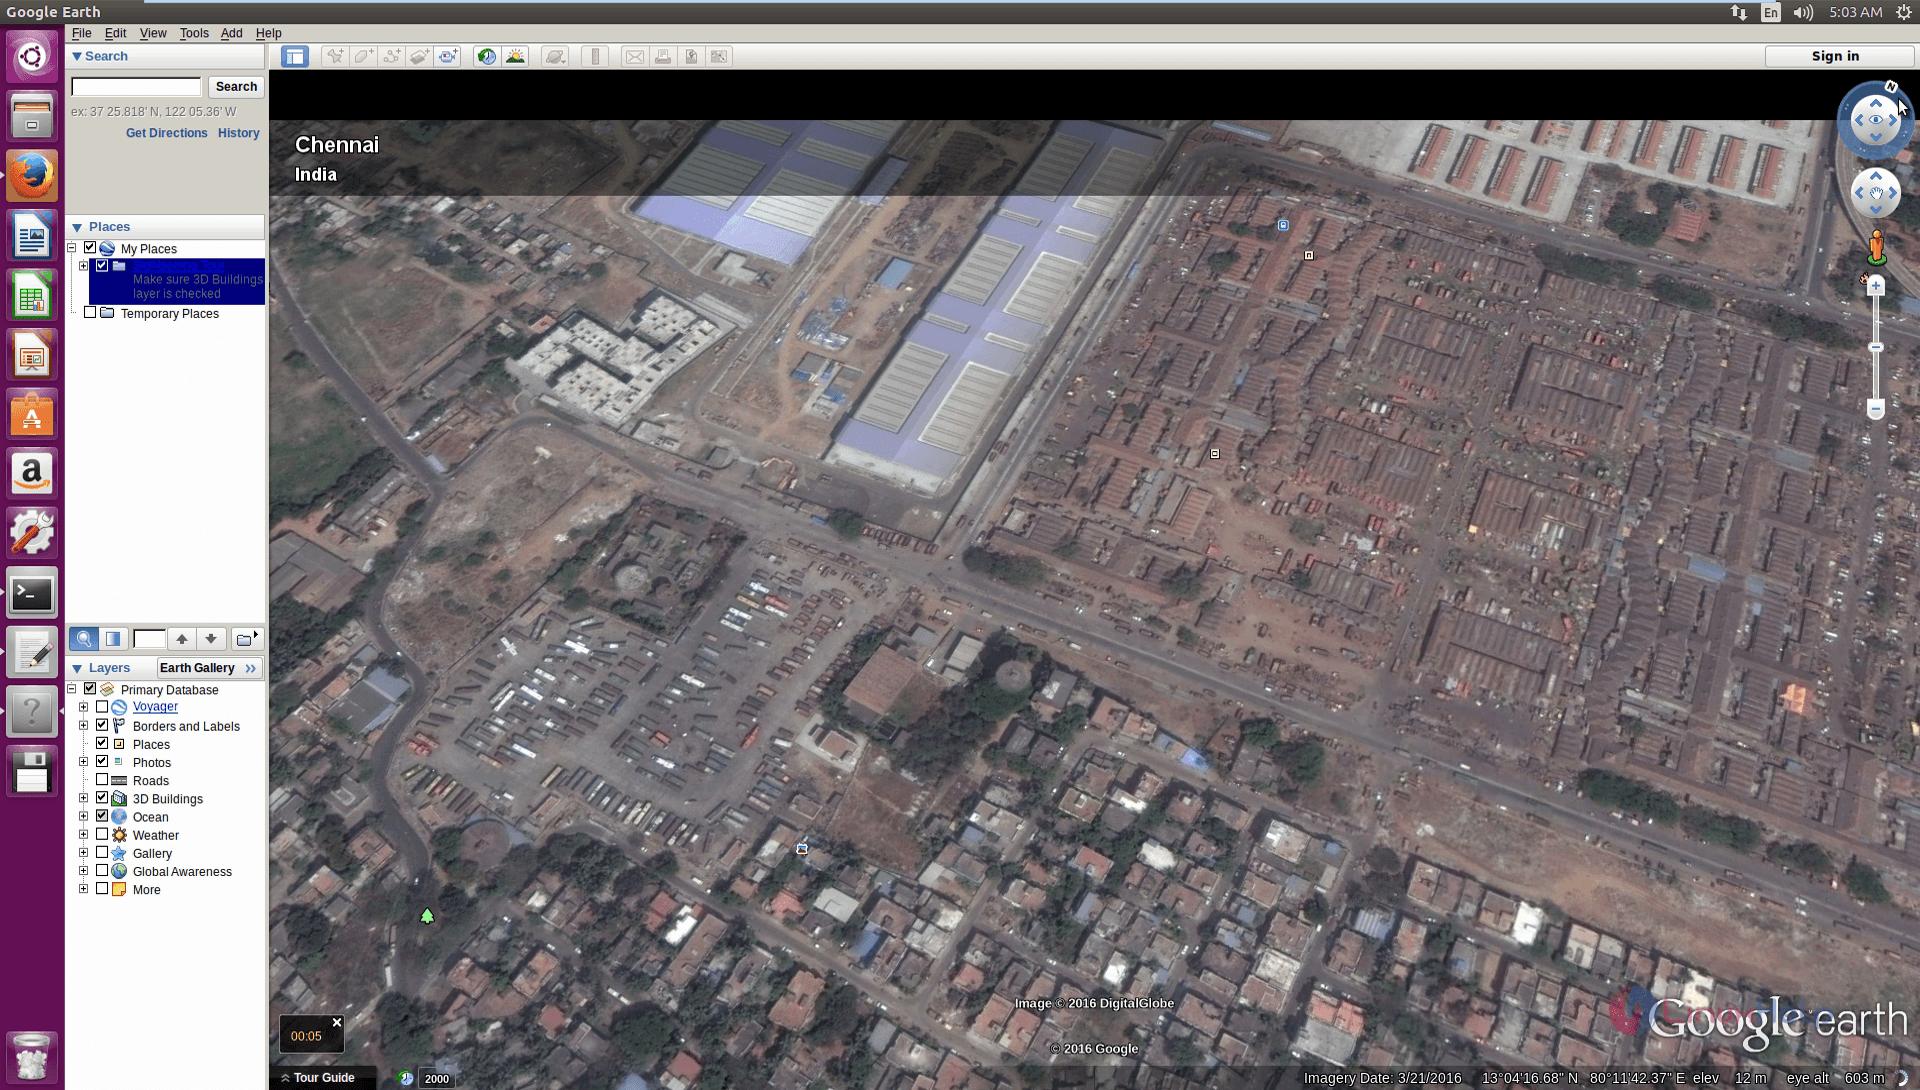 Installation_Google_Earth_Ubuntu16.04_Rotation_option